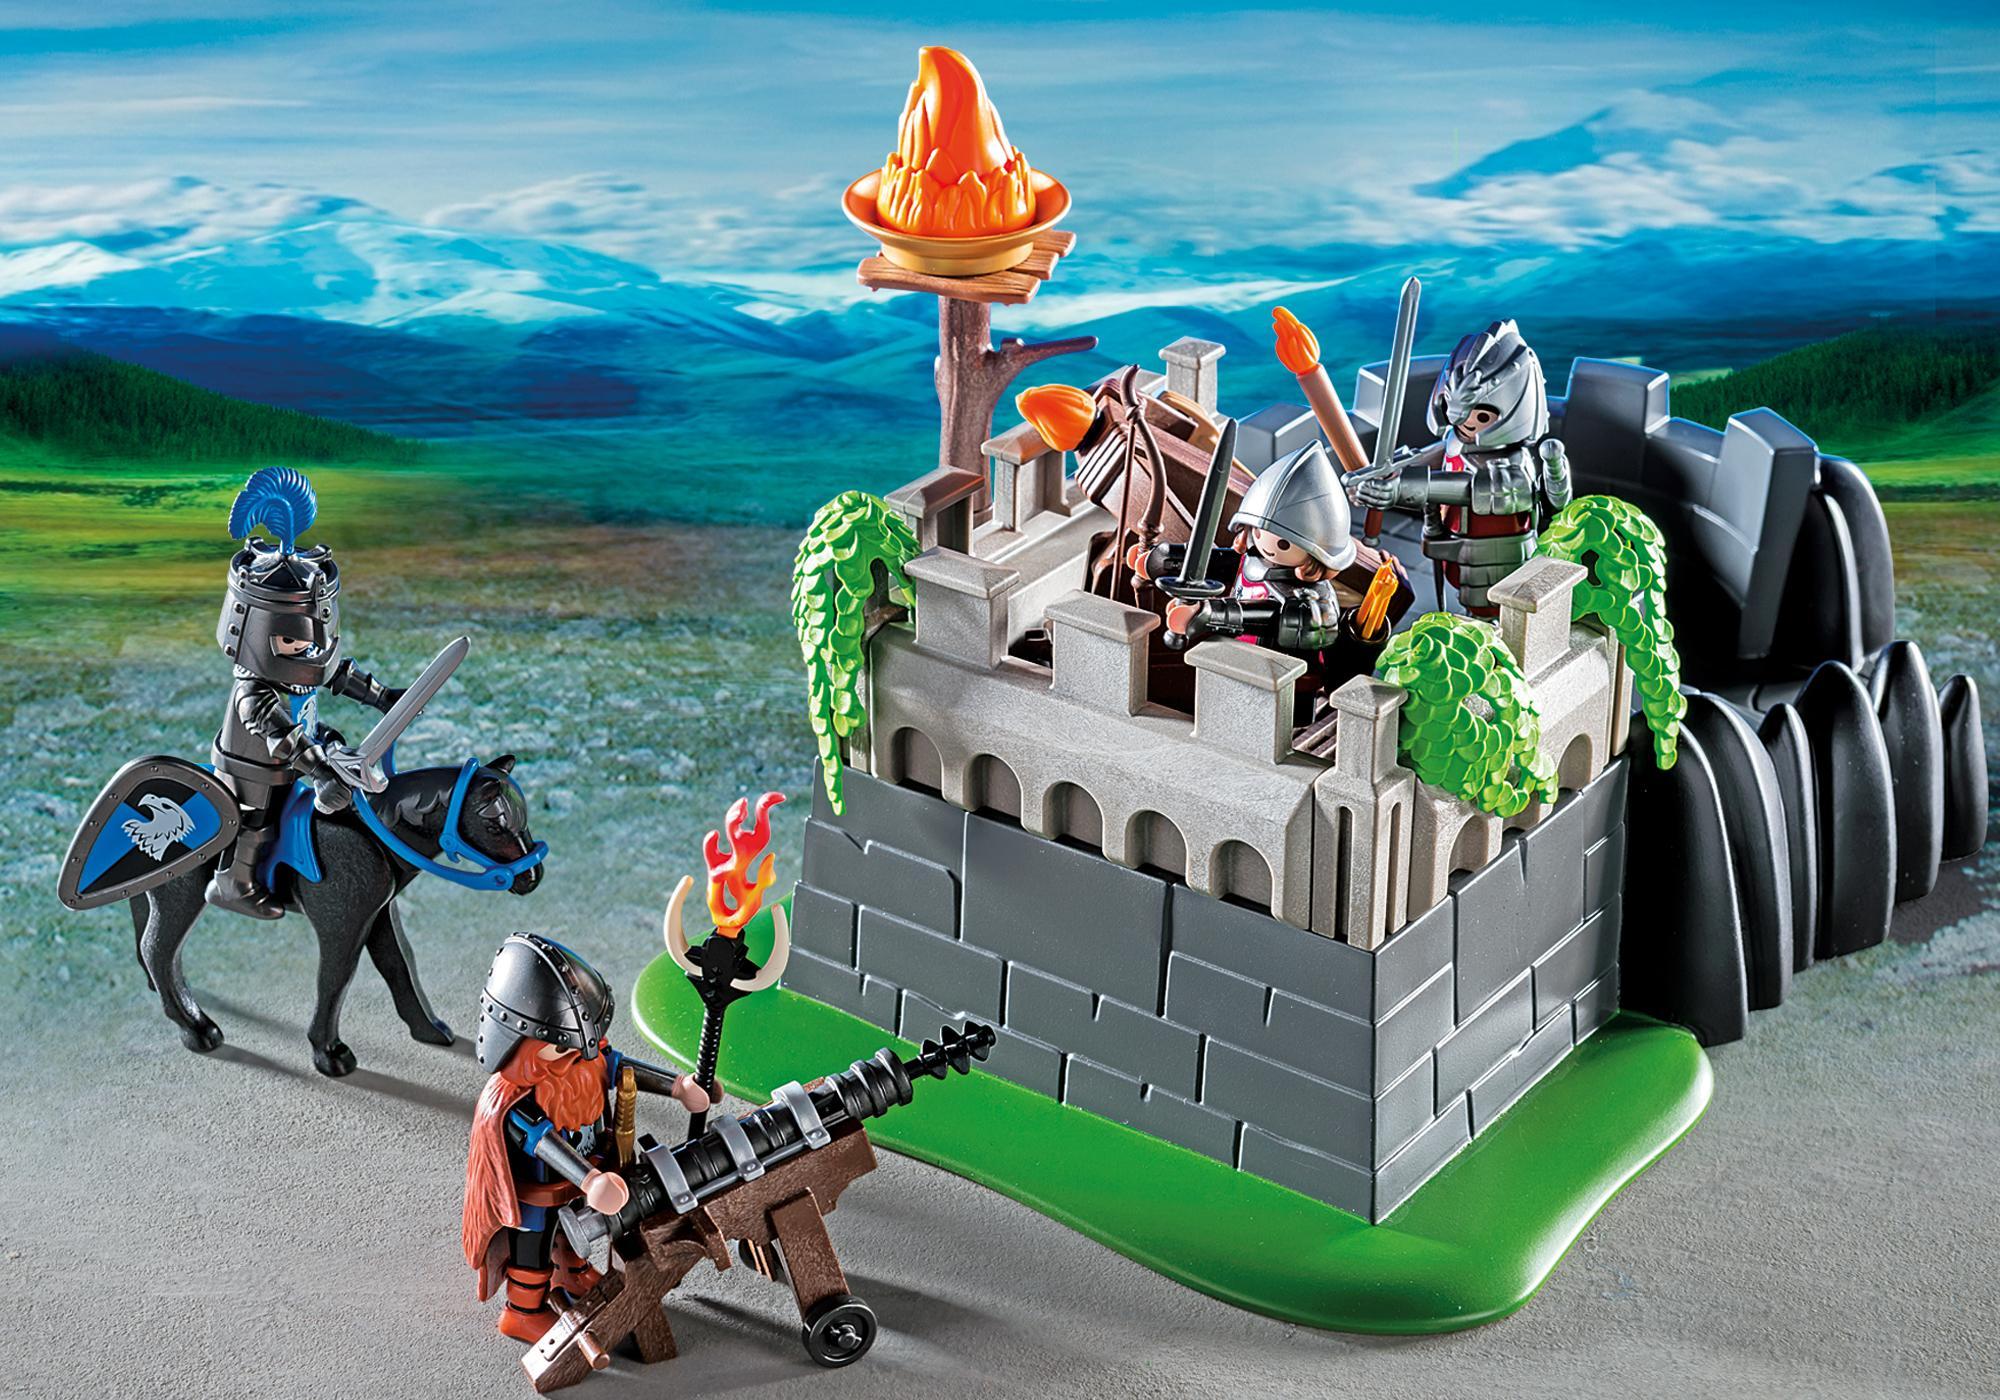 http://media.playmobil.com/i/playmobil/6627_product_extra2/Bastion des chevaliers du Dragon Ailé